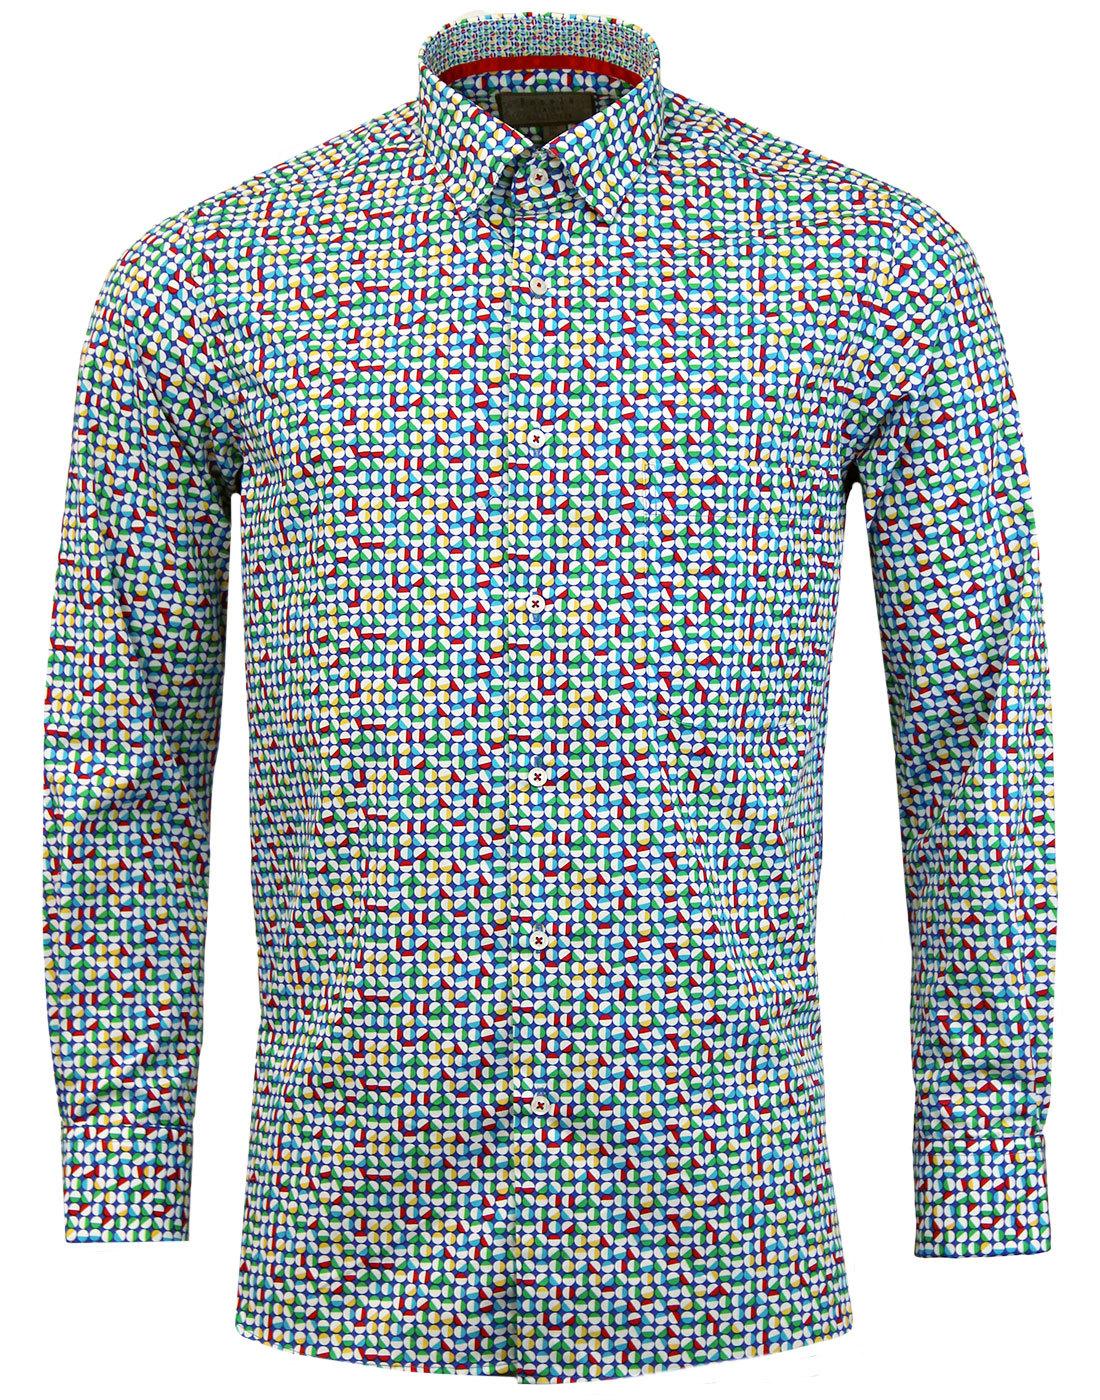 ROCOLA Retro Mod Op Art Circle Button Under Shirt